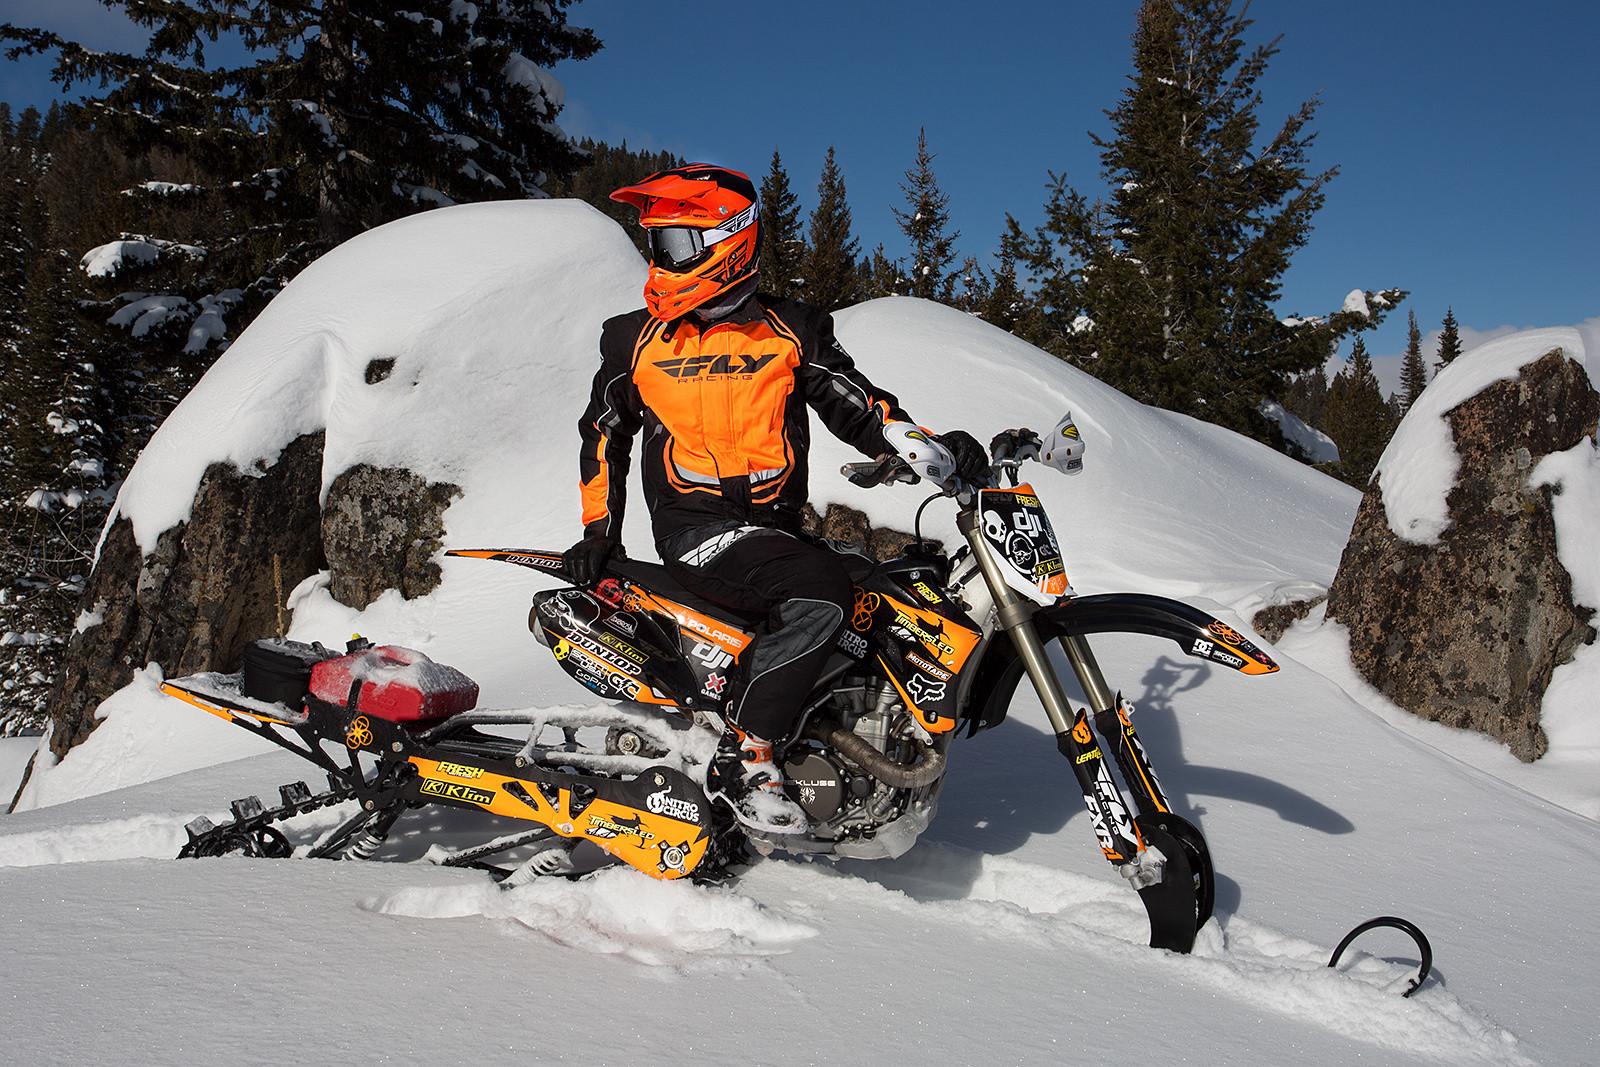 Snow Dirt Bike >> Dirt Vs Snow First Time On A Snow Bike Motocross Feature Stories